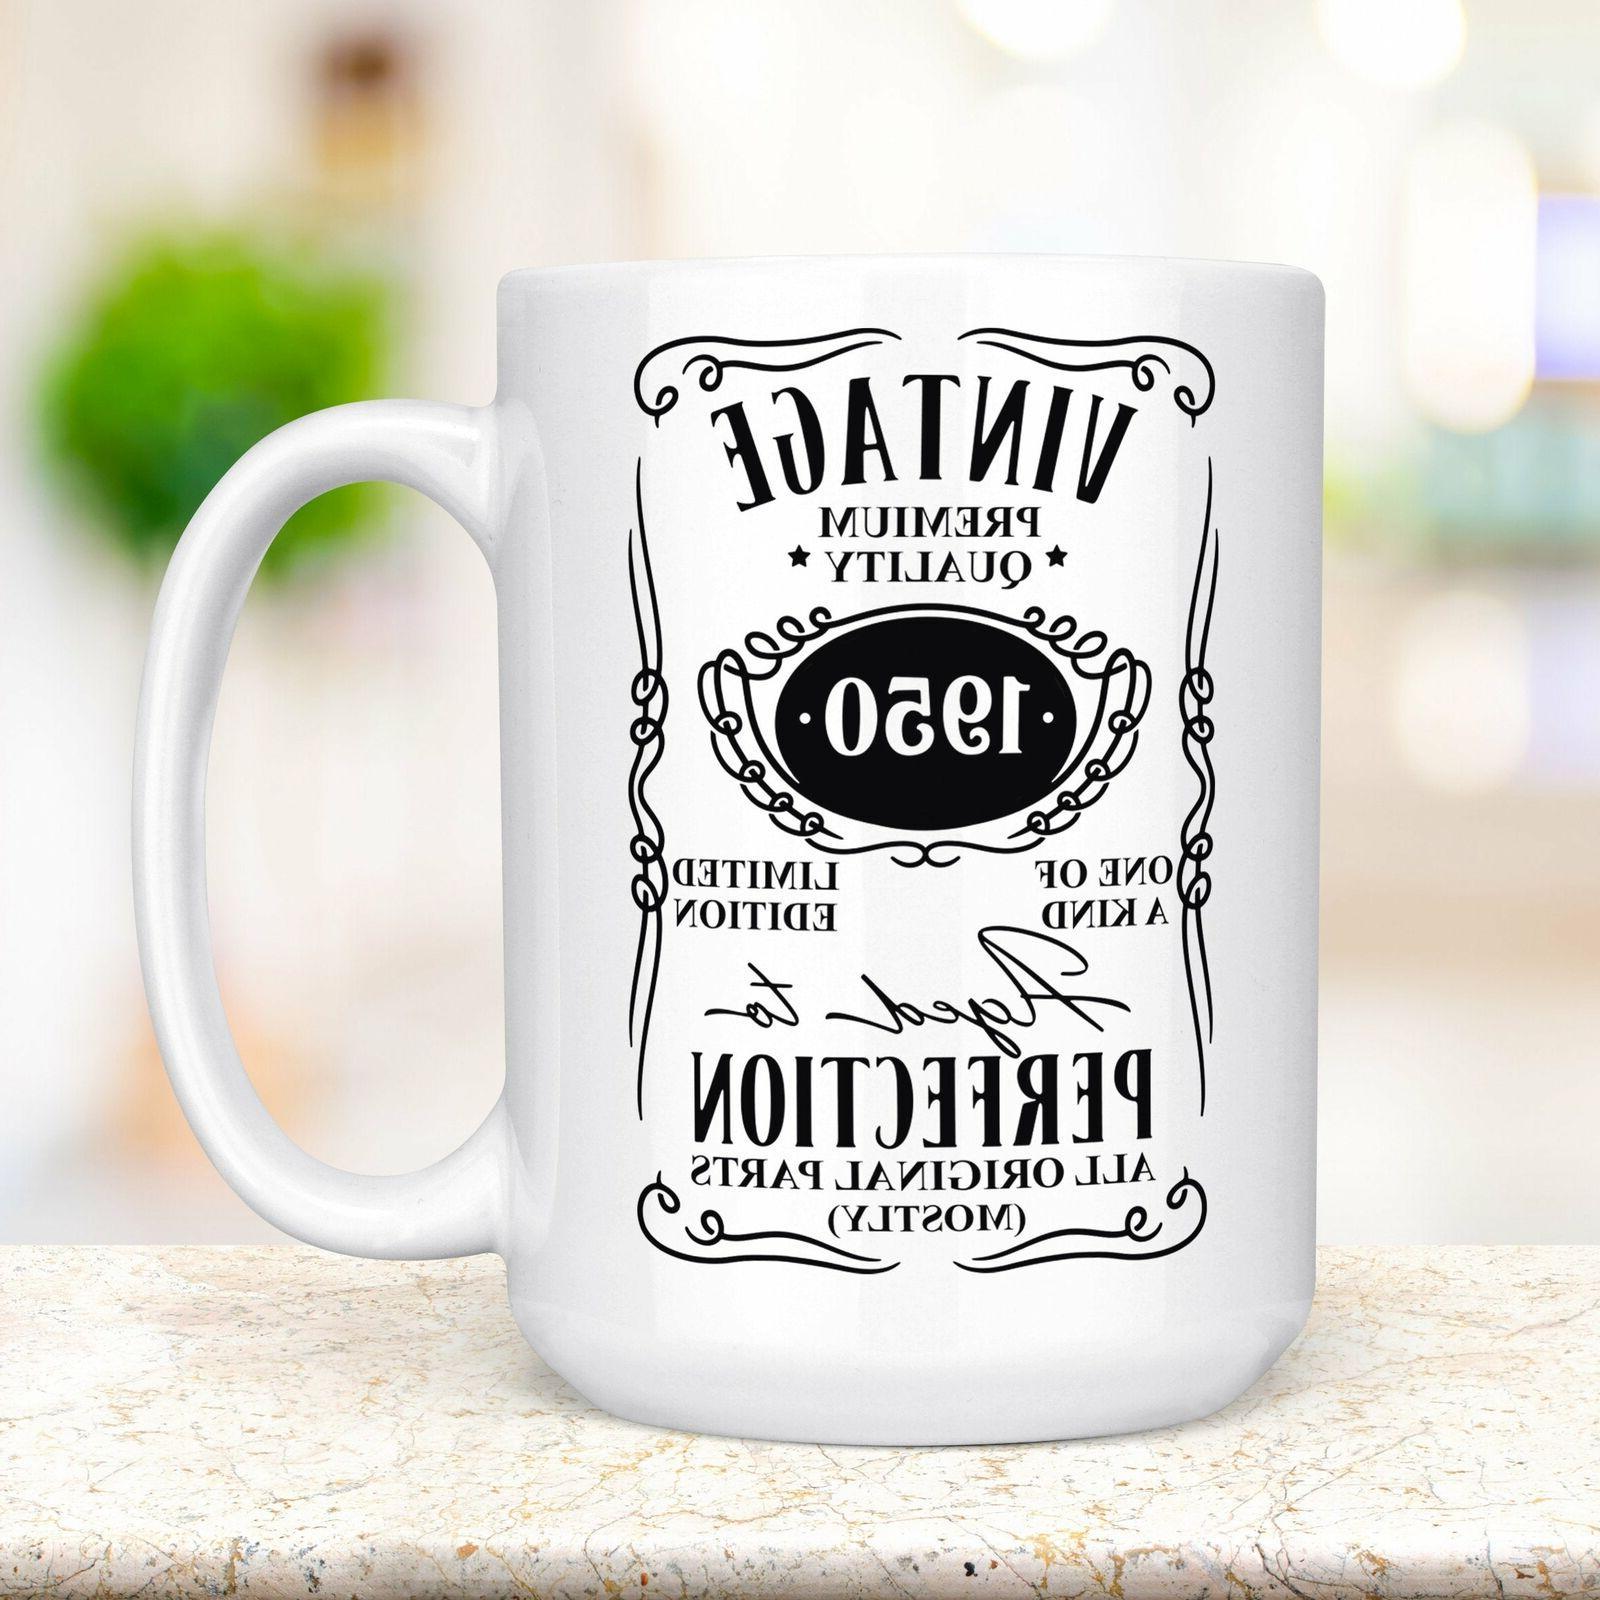 70th birthday gift funny coffee mug microwave